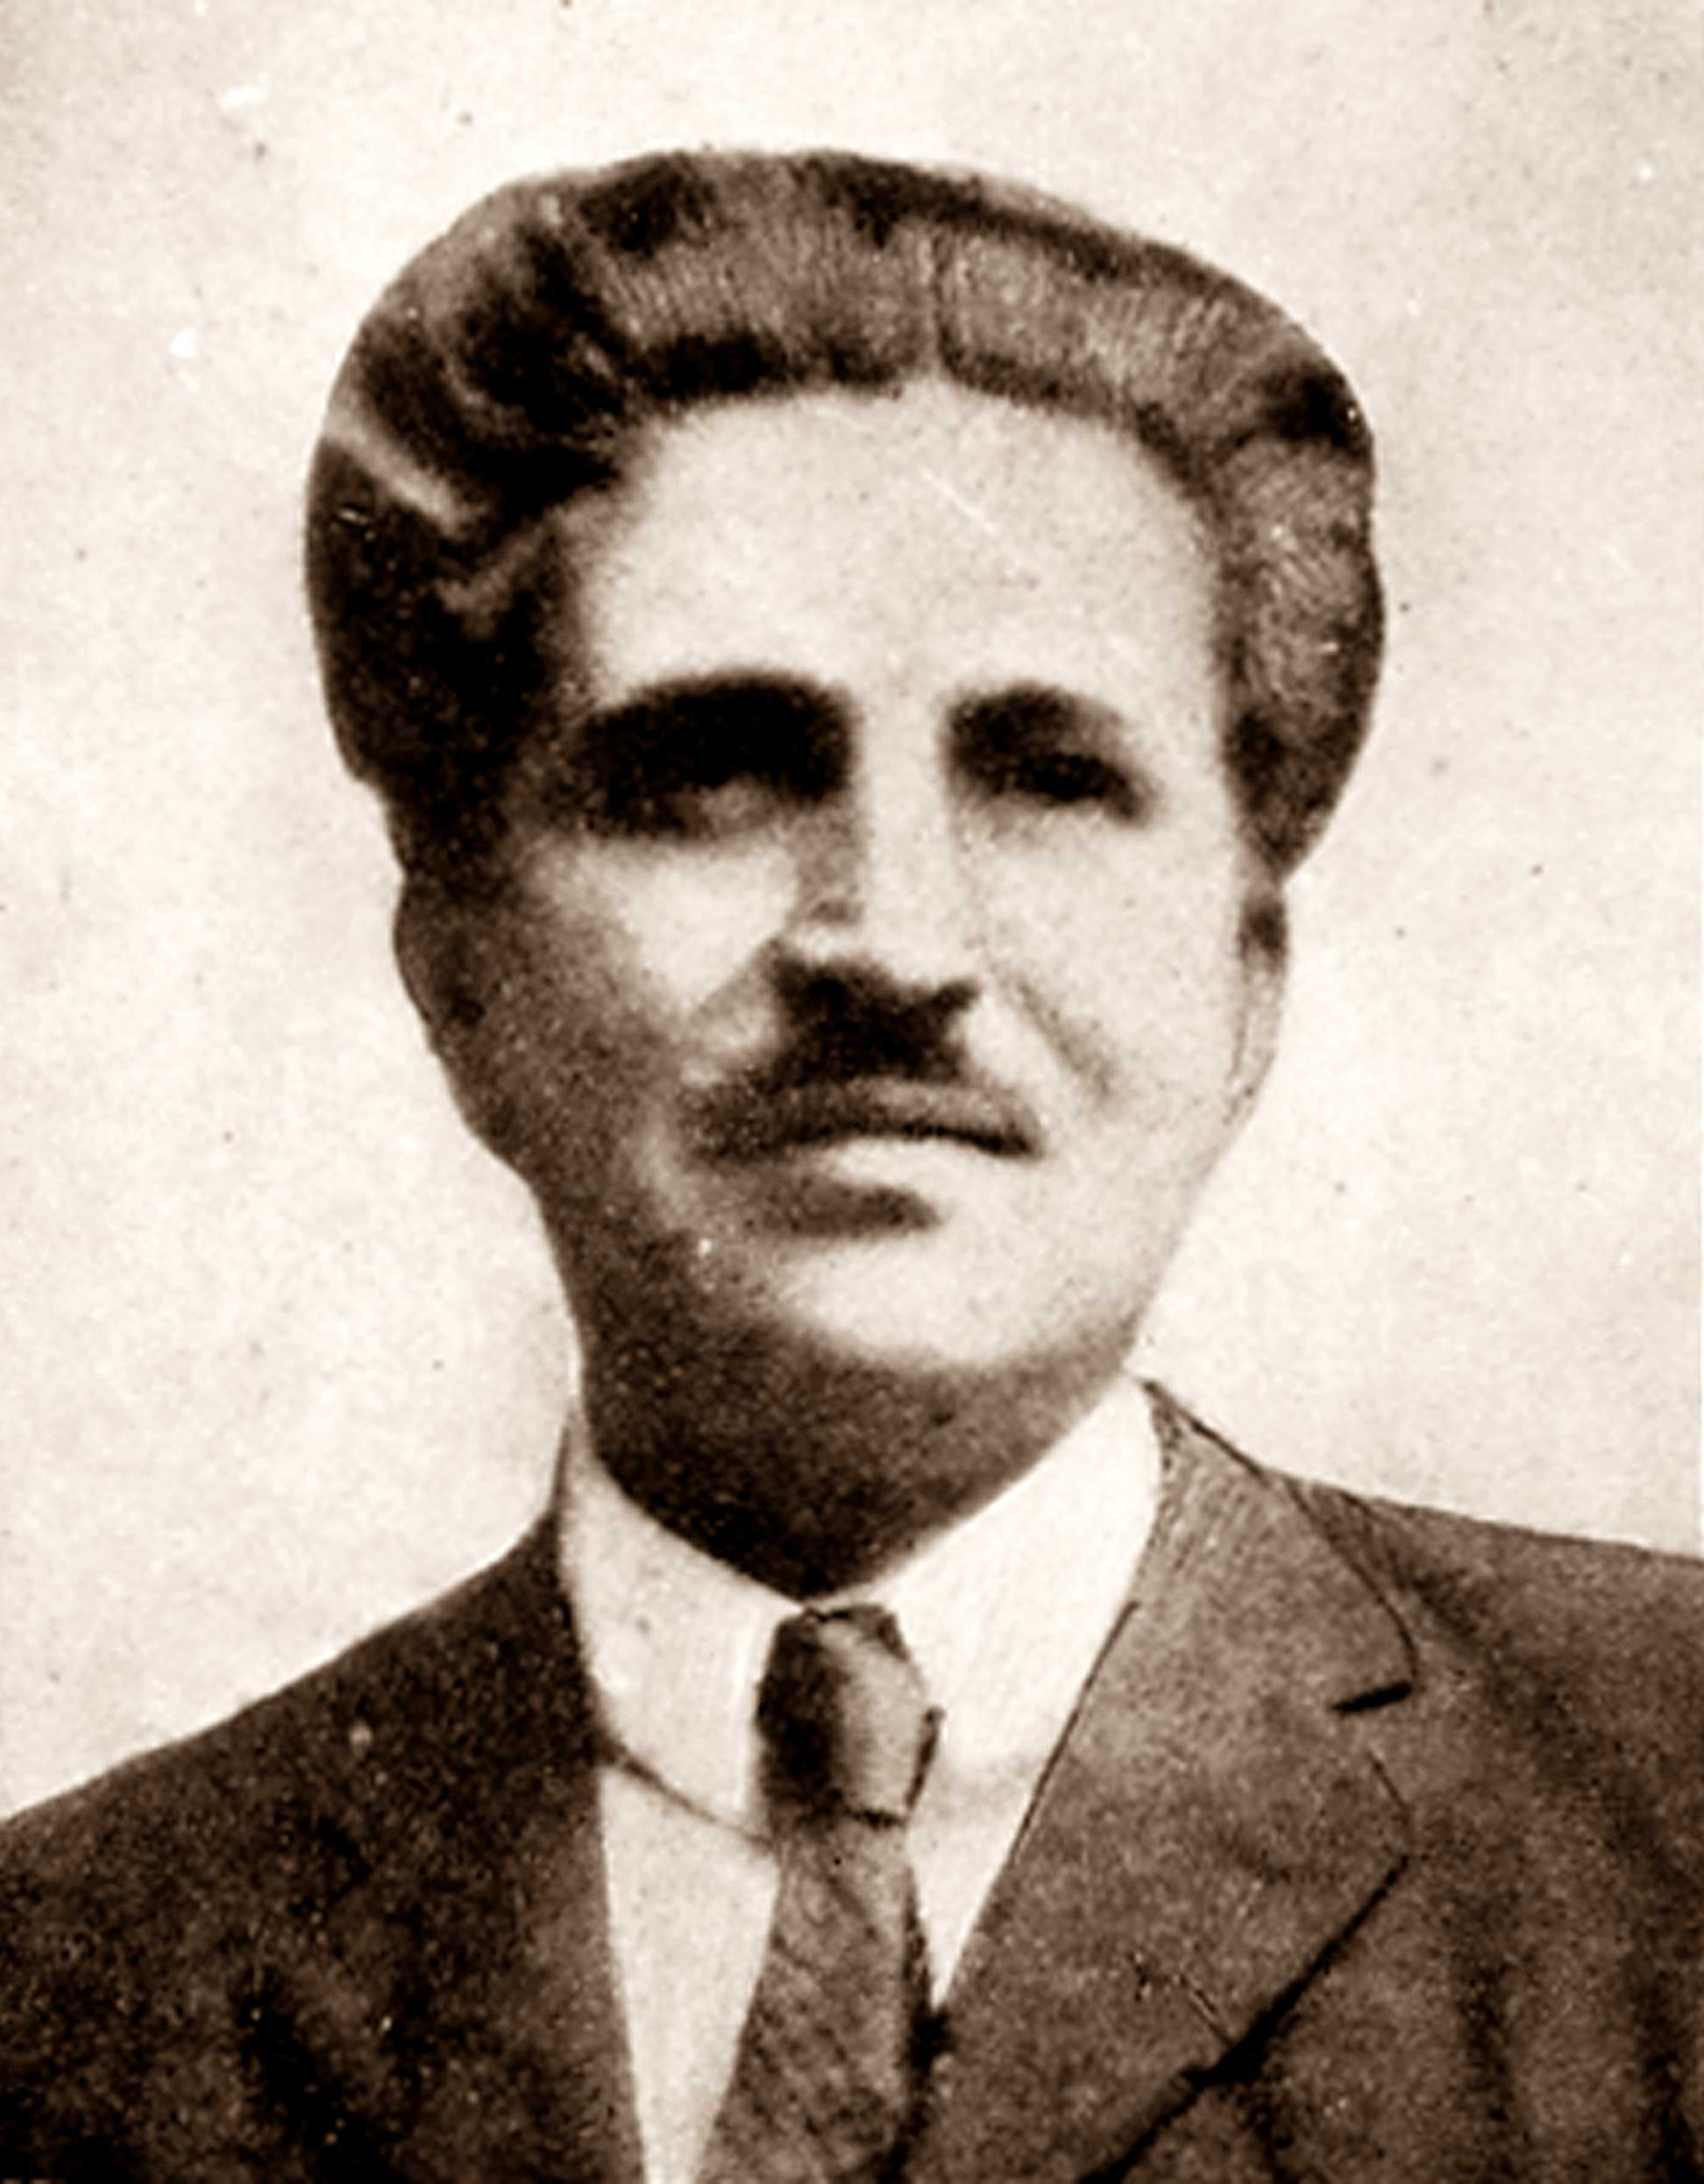 Carlo Berruti